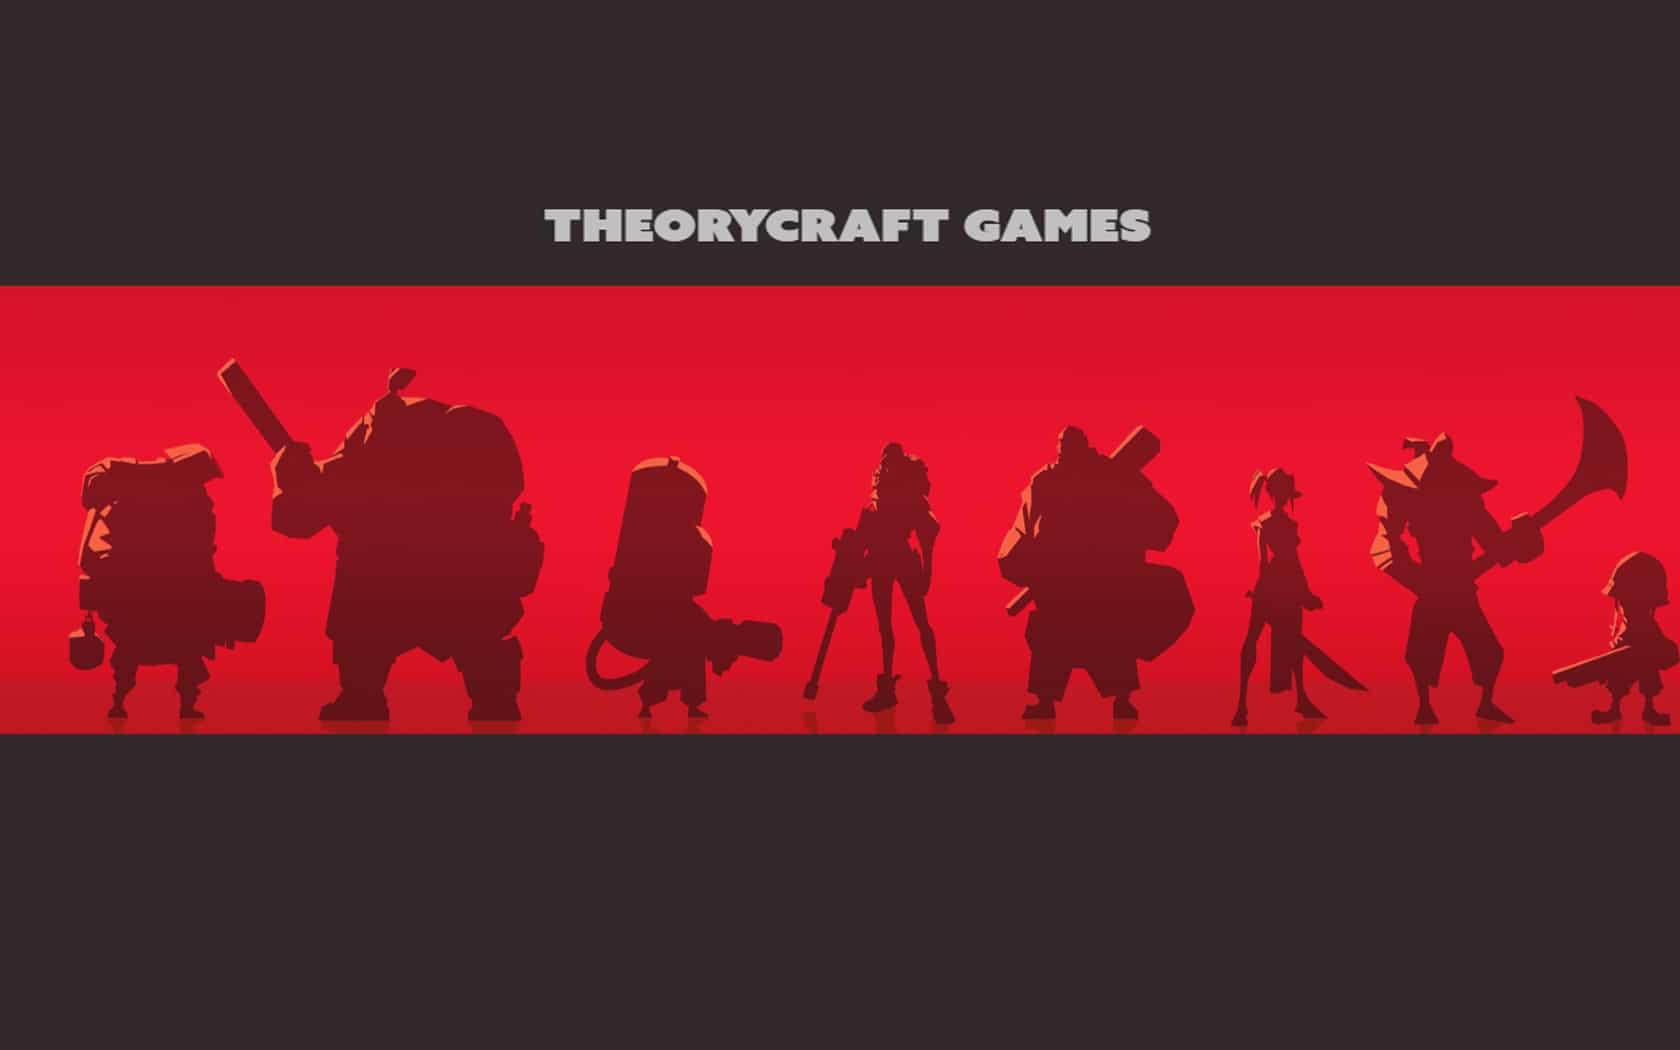 THEORYCRAFT GAMES